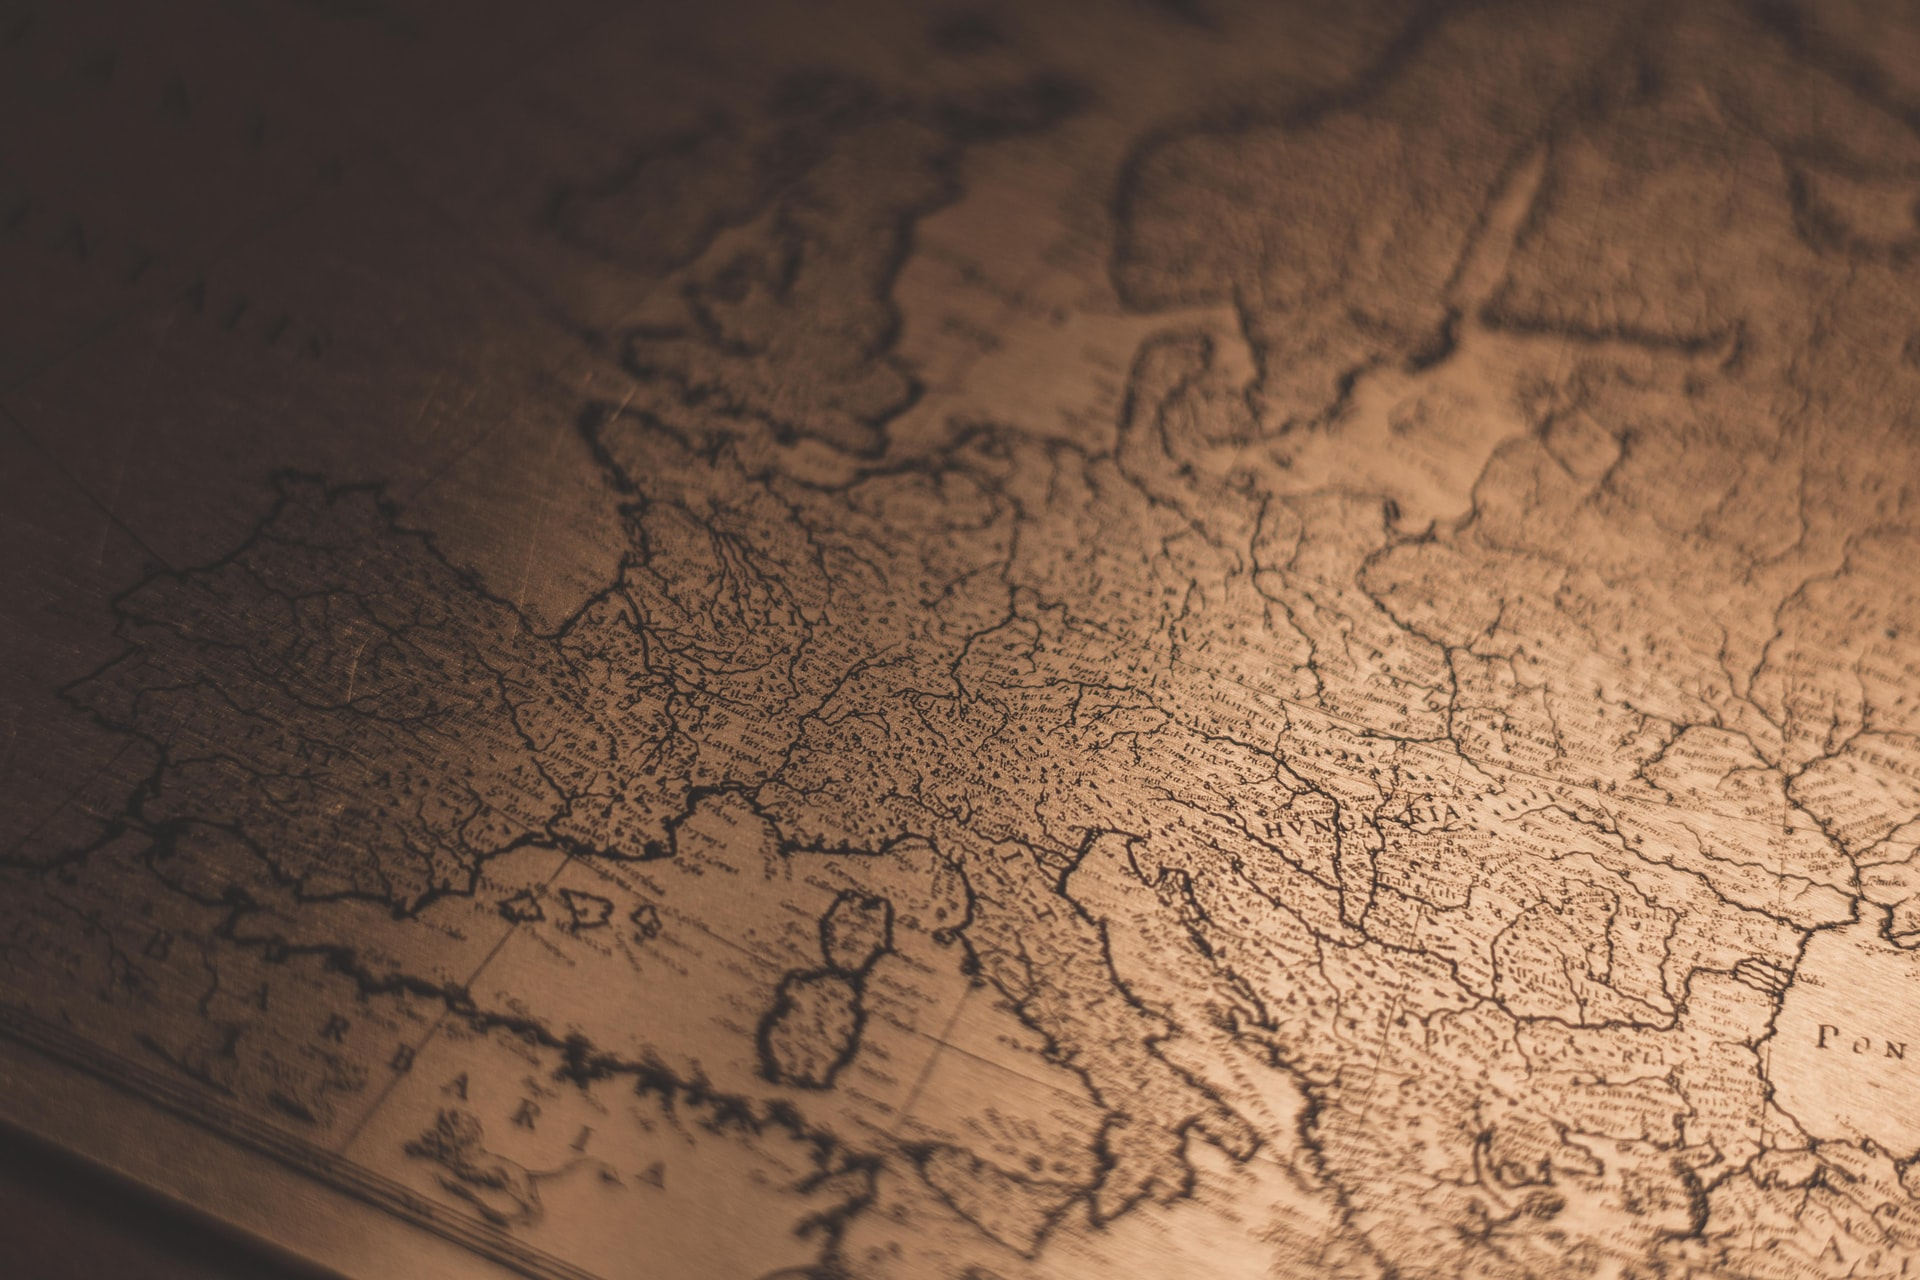 On Holiday: Nächster Halt – Europa!